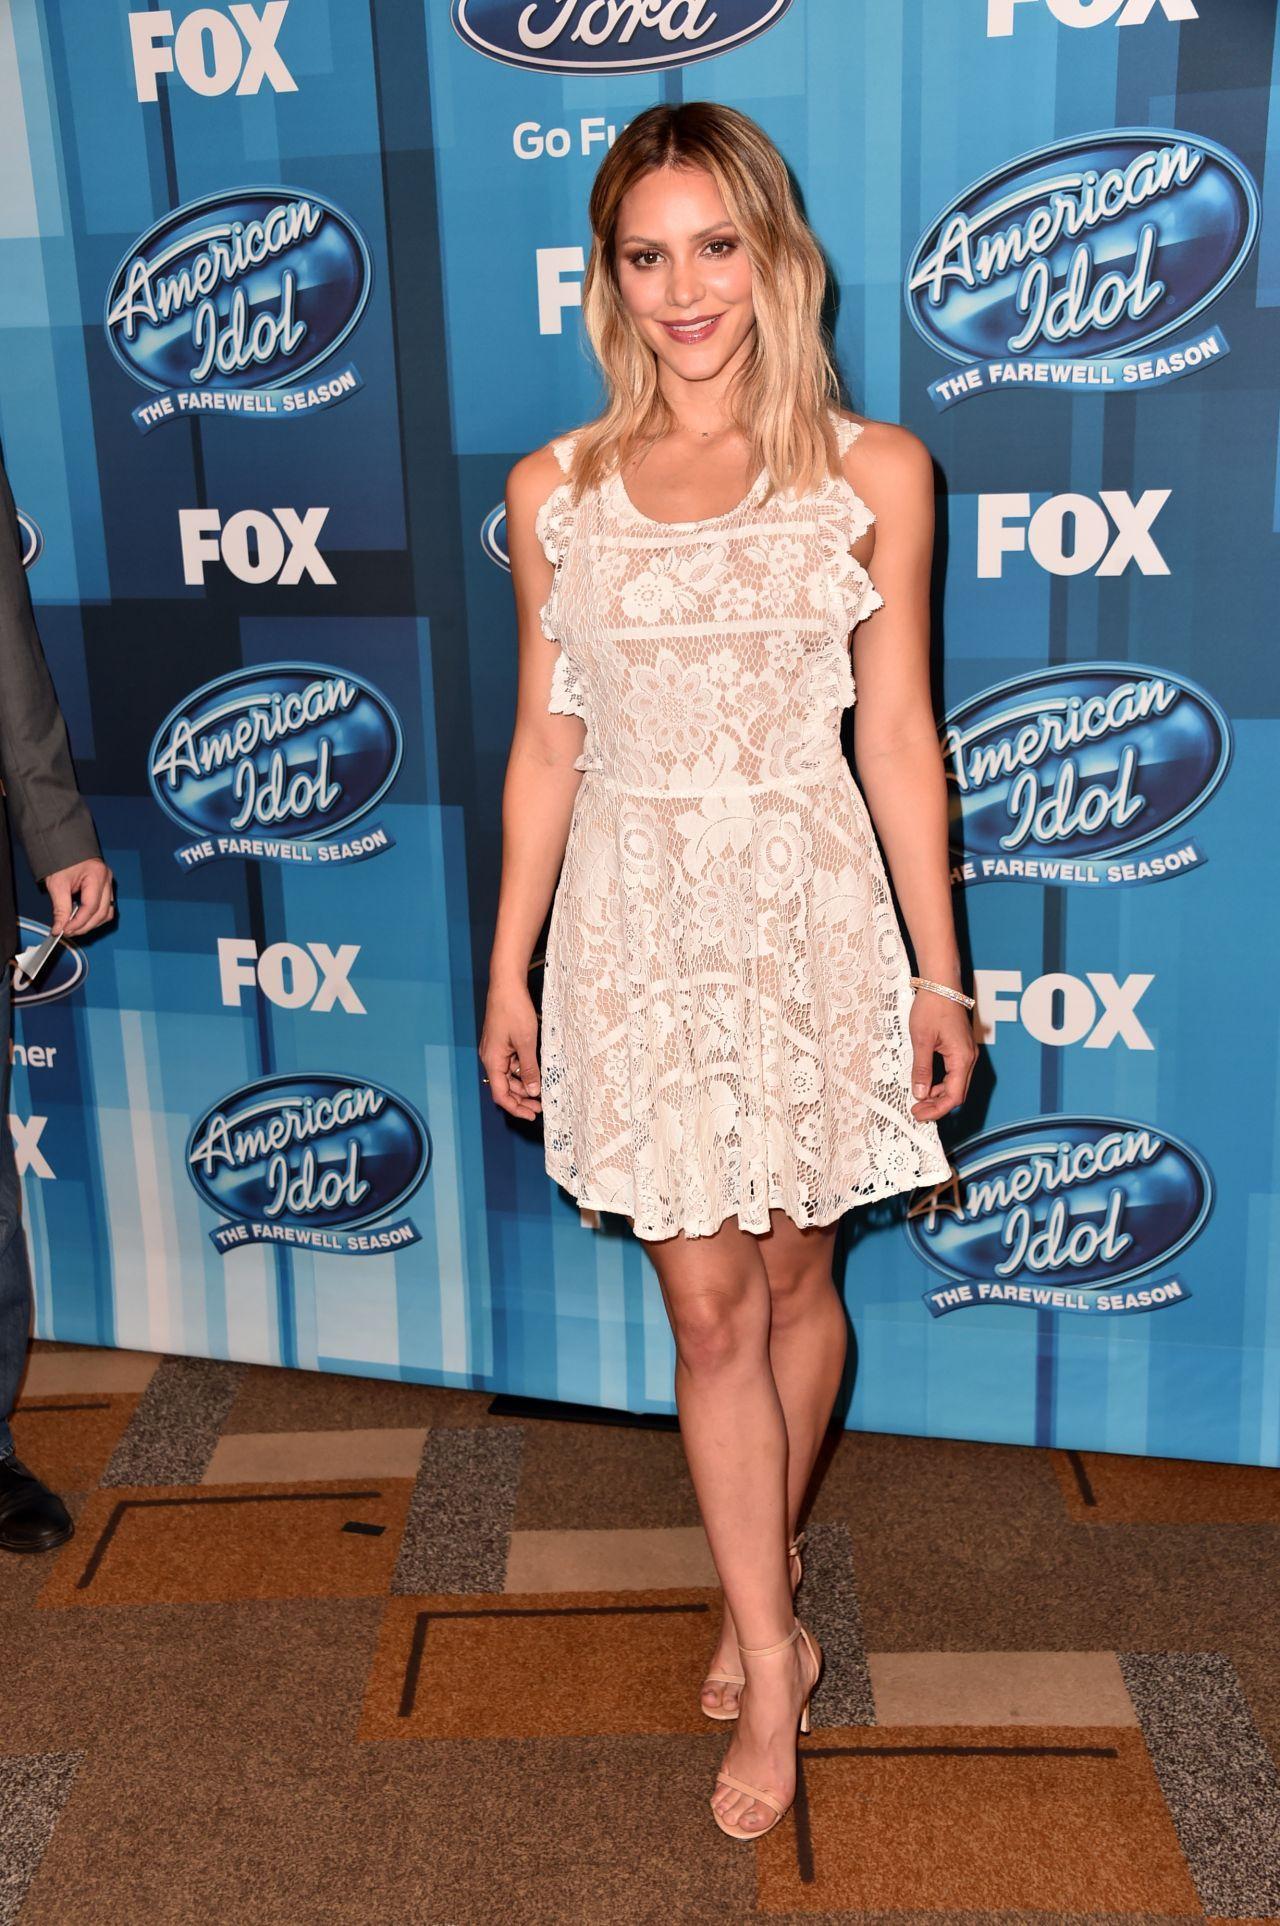 Katharine Mcphee American Idol Finale For The Farewell Season In Hollywood April 2016 Katharine Mcphee Katharine Mcphee American Idol Lace White Dress